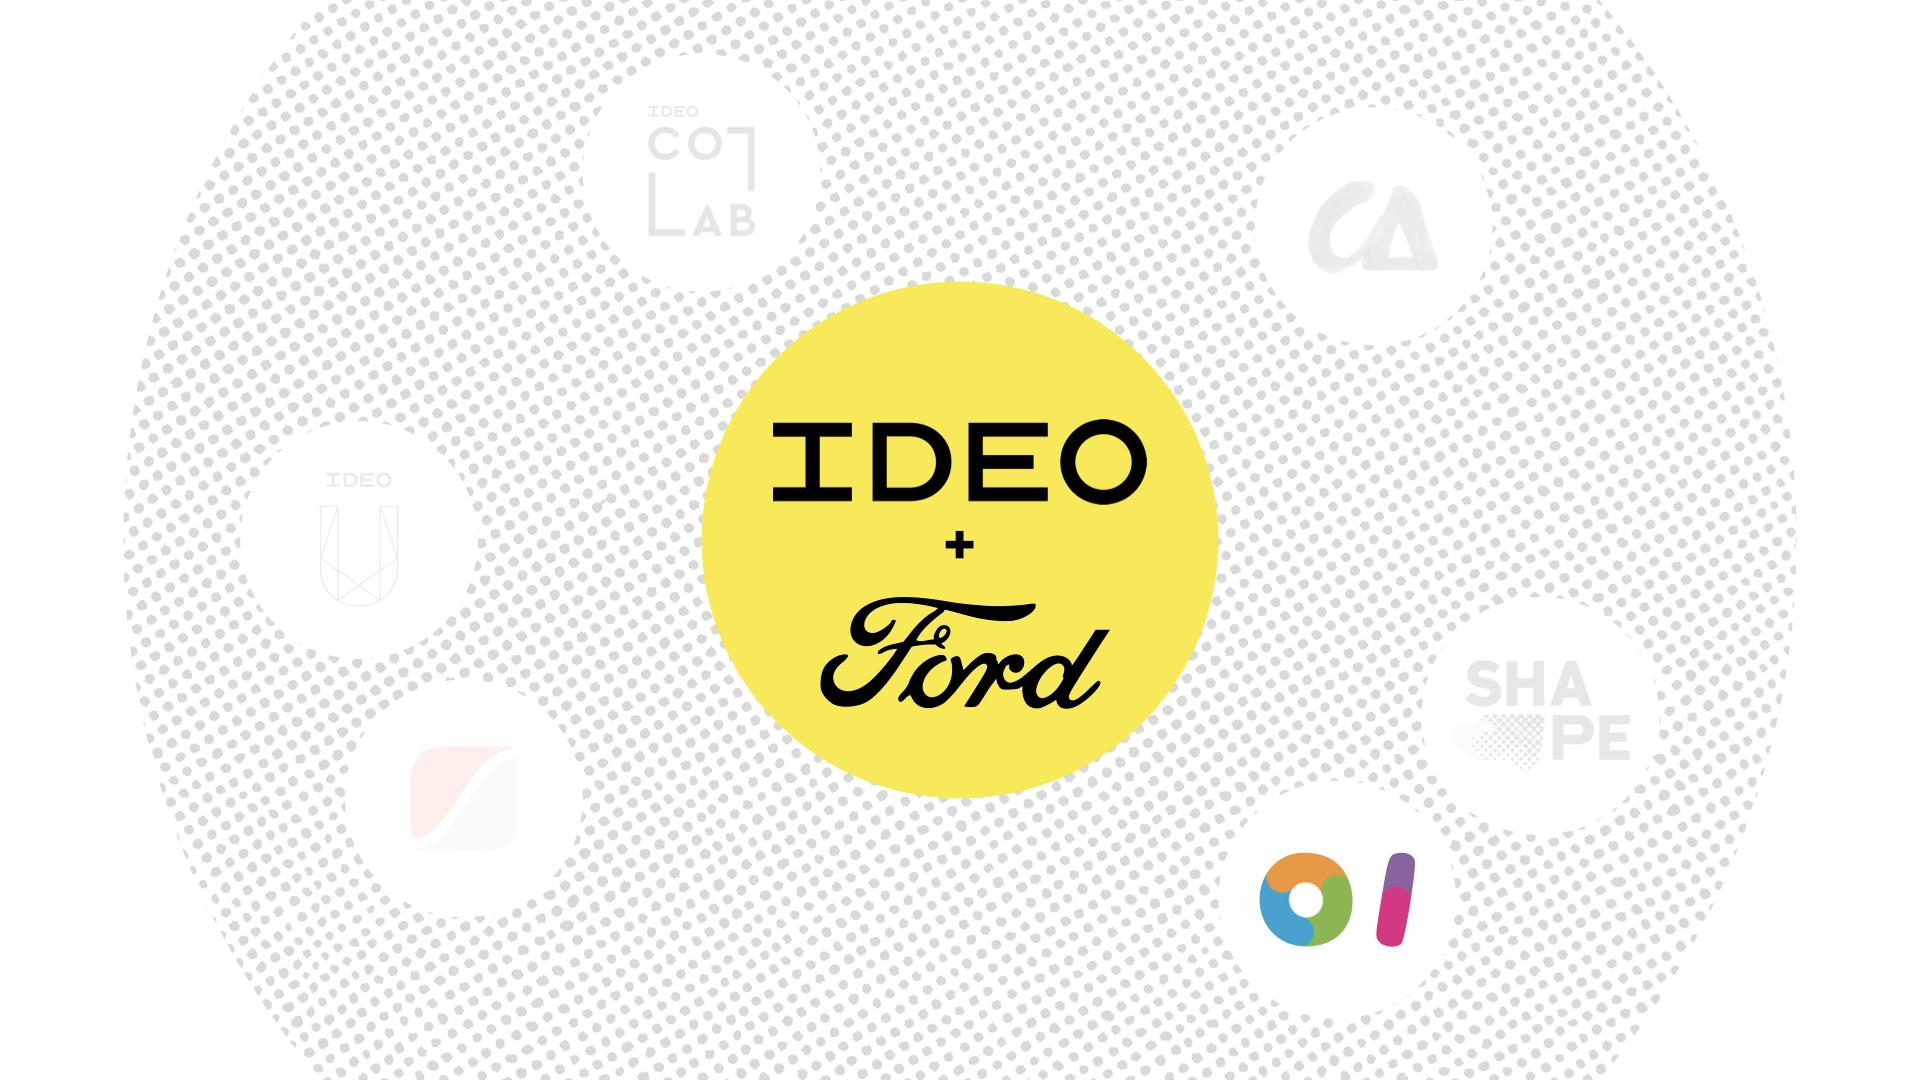 IDEO Products 101 [JL] copy.027.jpeg